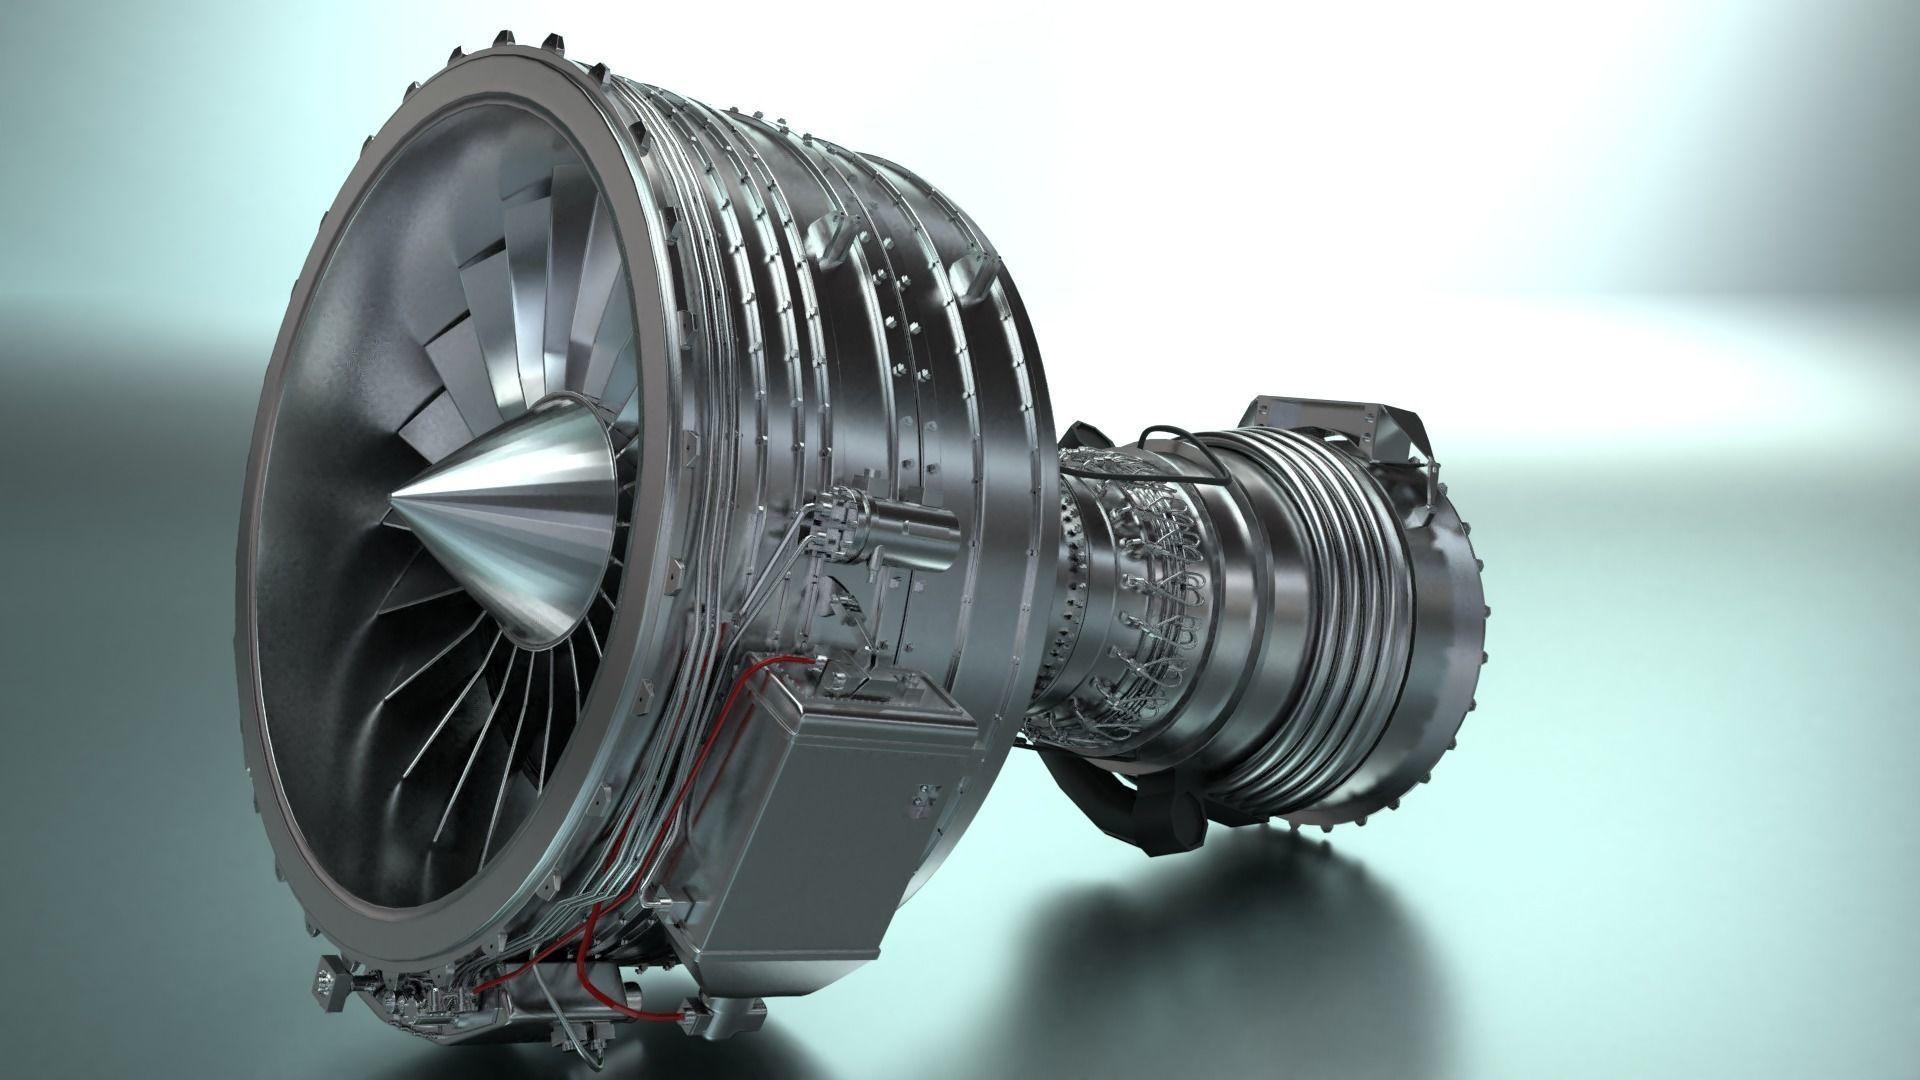 High Detailed Turbo fan CFM56